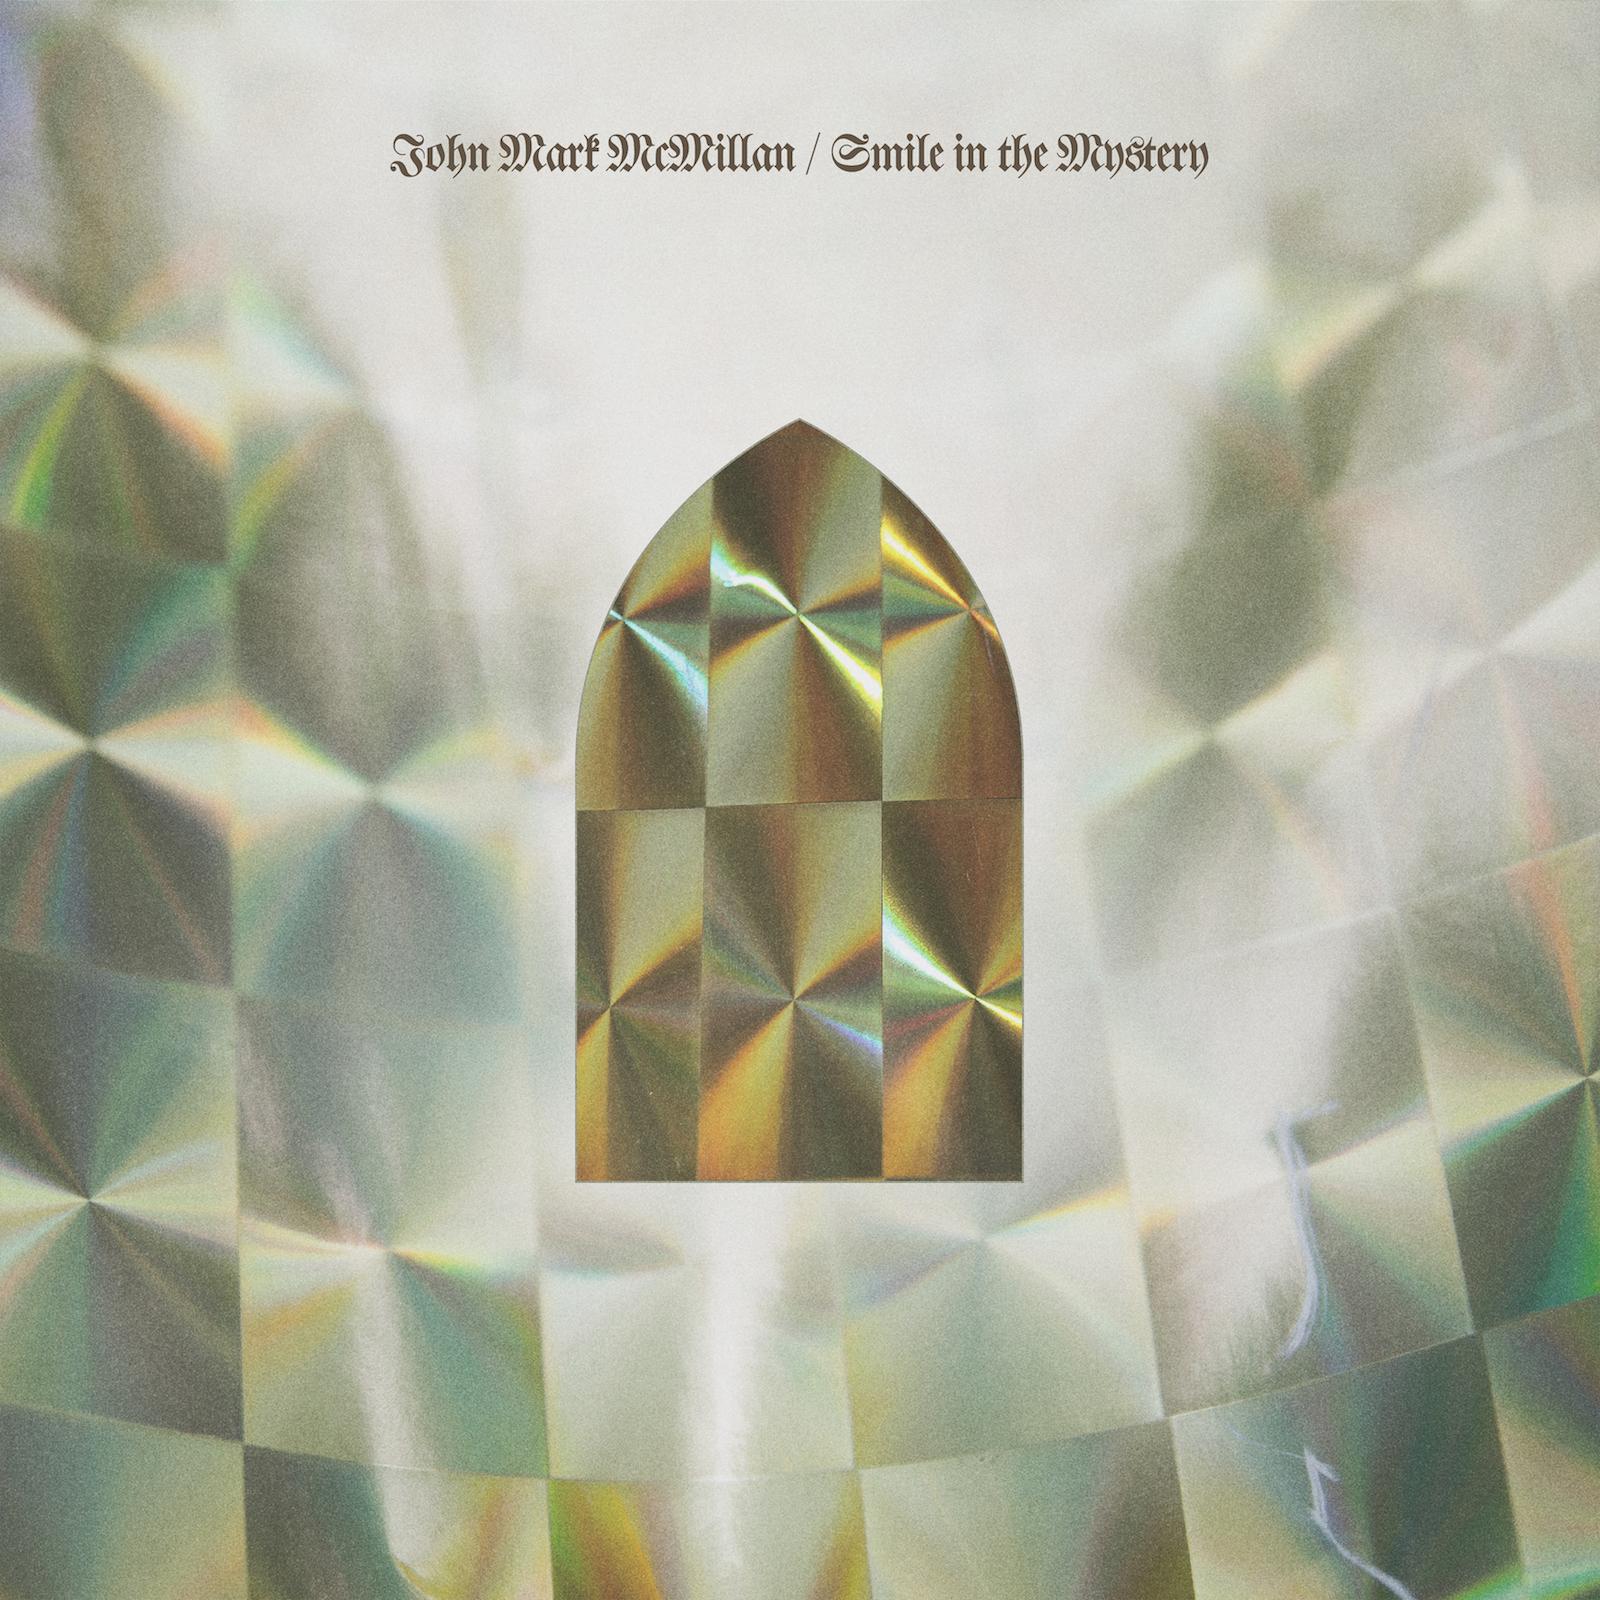 JMM-SmileInTheMystery-cover 1600x1500.jpeg